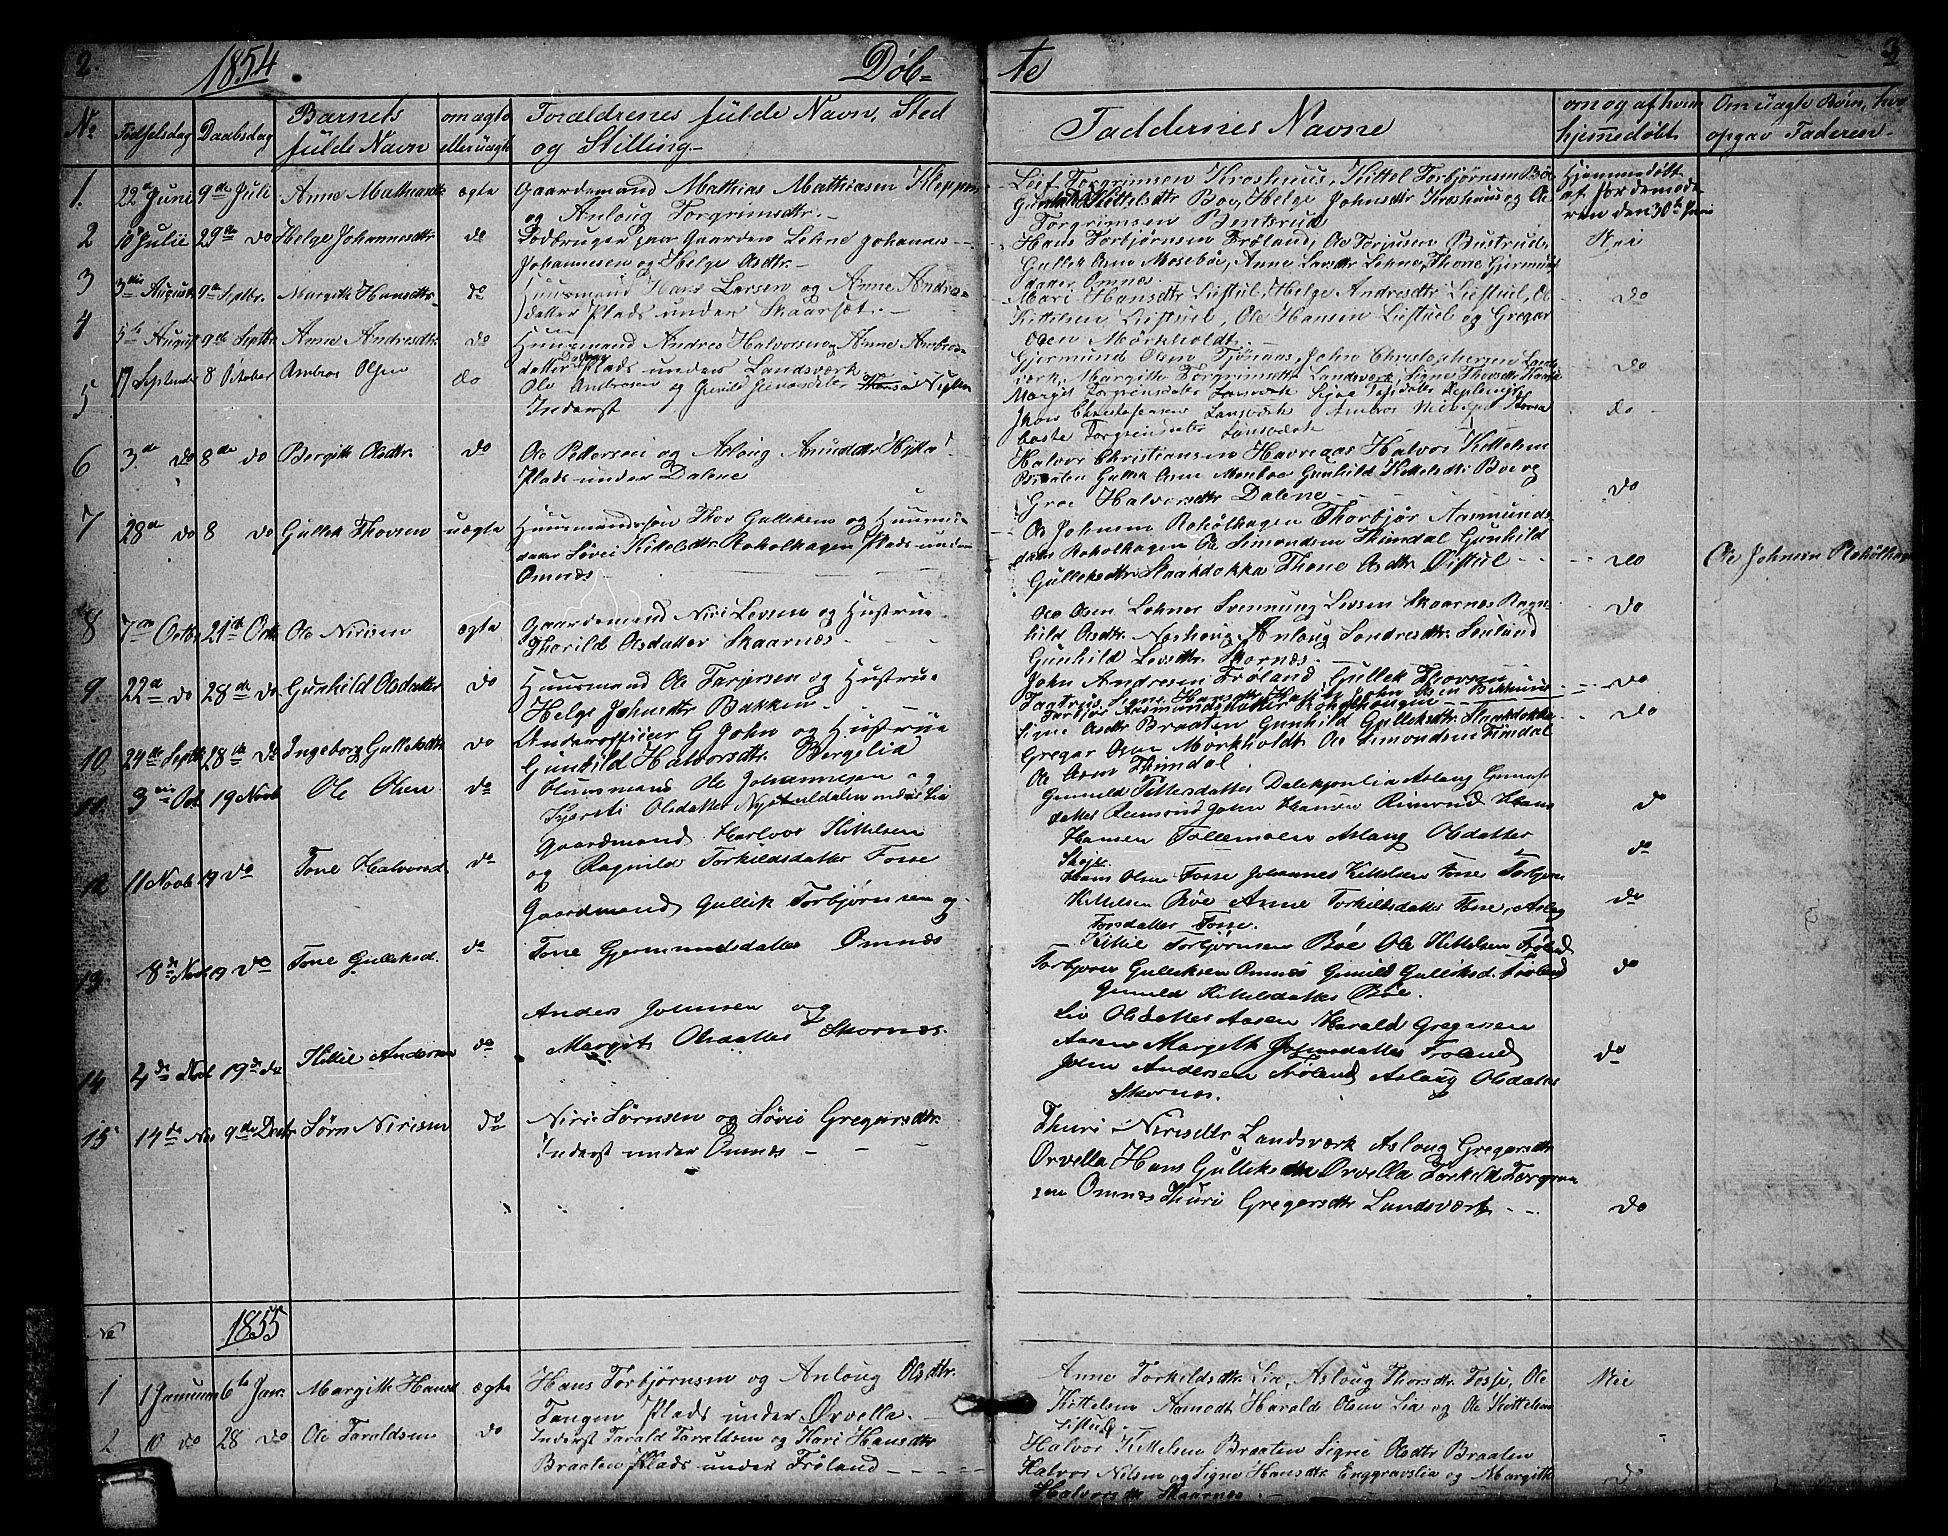 SAKO, Hjartdal kirkebøker, G/Gb/L0002: Klokkerbok nr. II 2, 1854-1884, s. 2-3